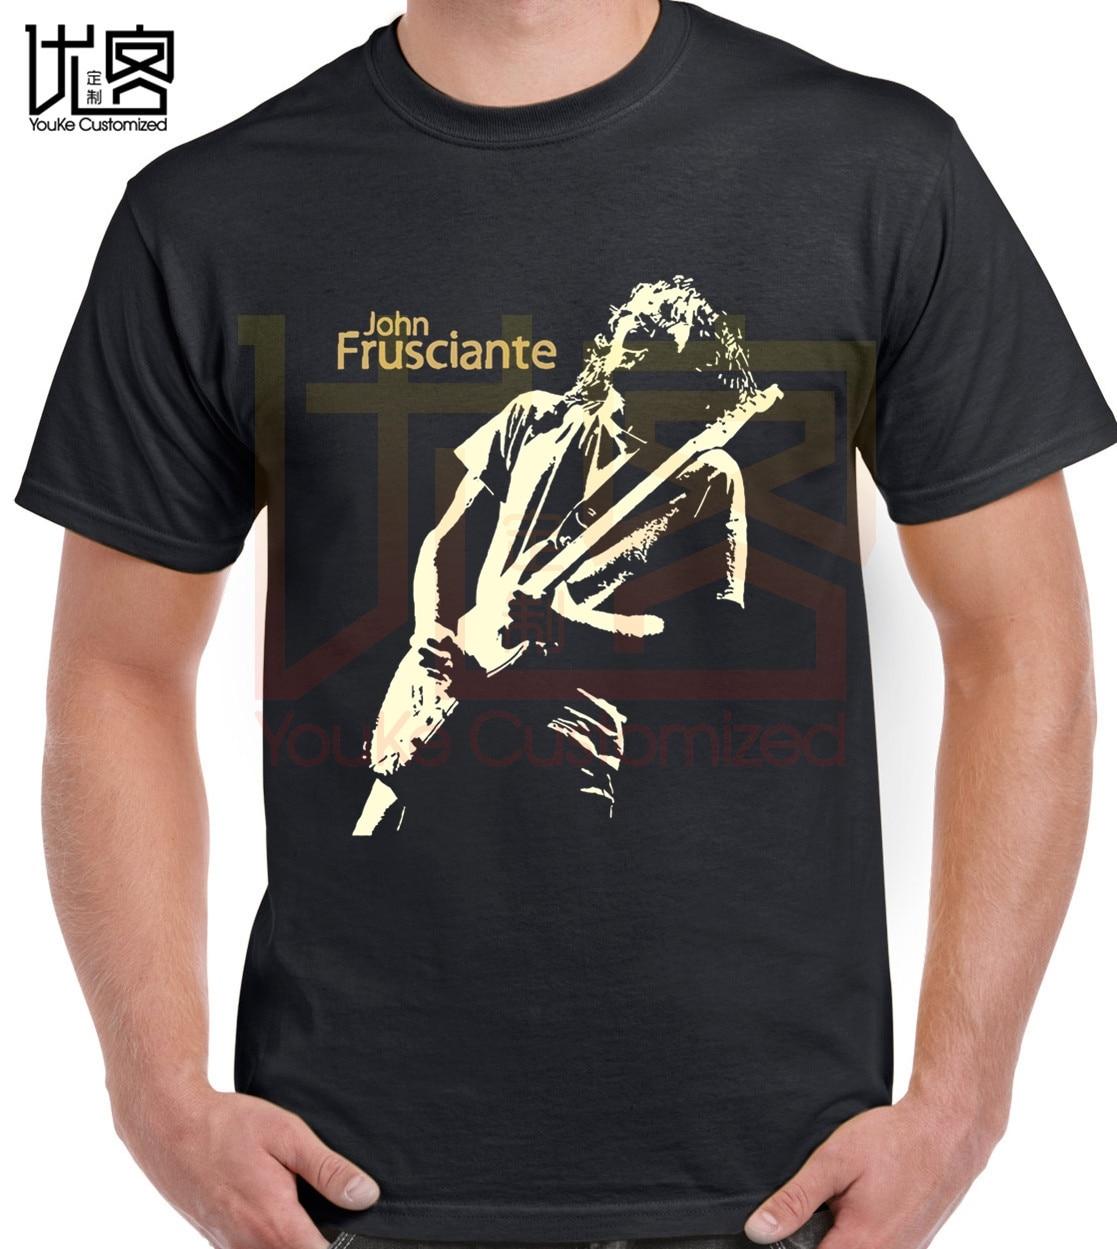 John Frusciante T-shirt Men's Women's New Fashion Crewneck 100% Cotton Short Sleeves Tops Tee Printed Unisex Casual T-shirt